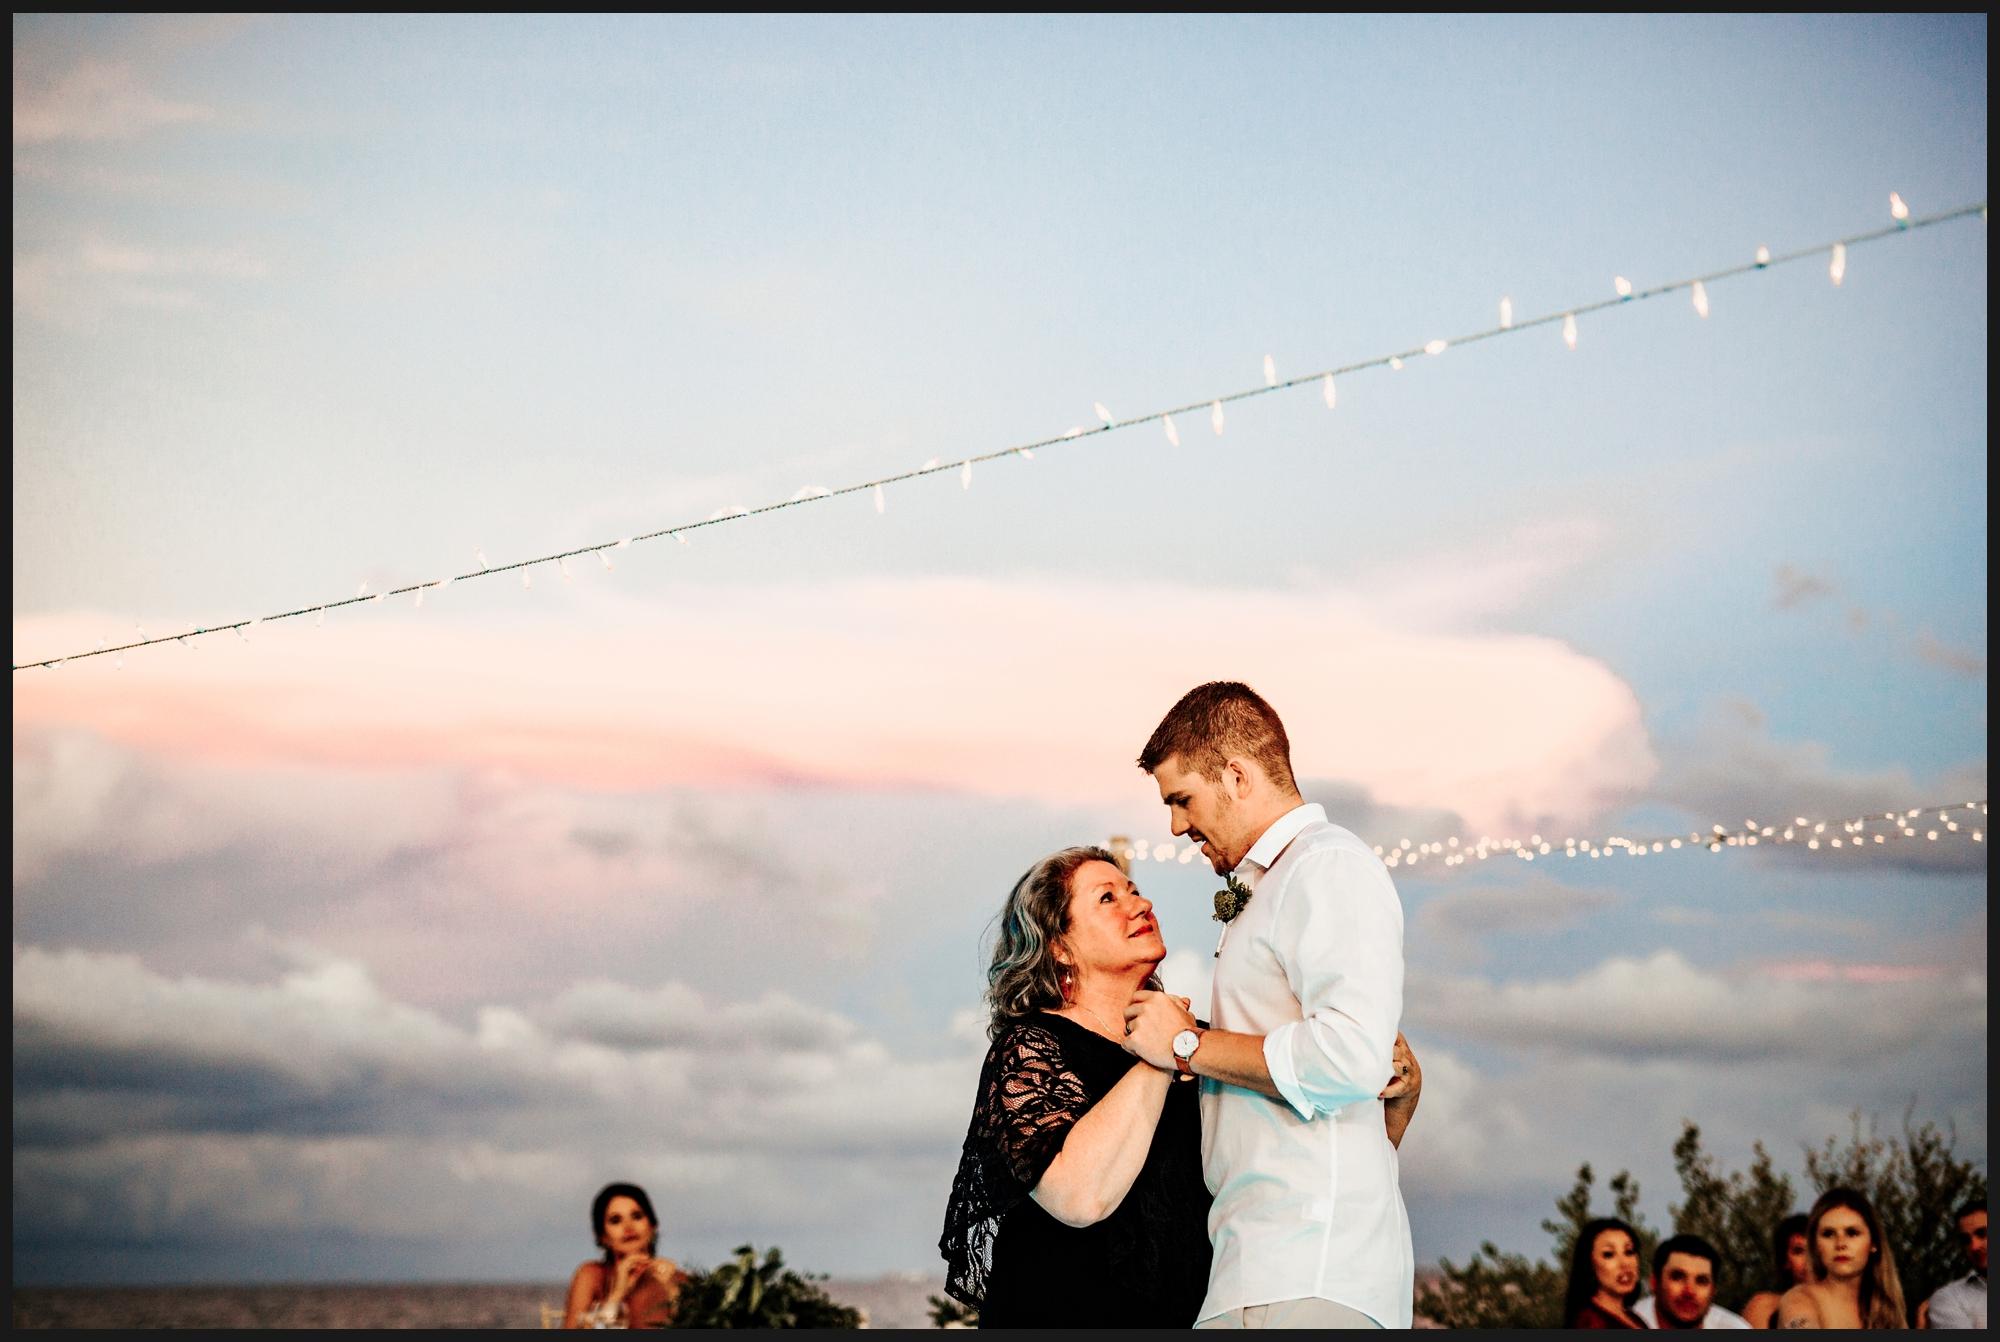 Orlando-Wedding-Photographer-destination-wedding-photographer-florida-wedding-photographer-bohemian-wedding-photographer_0545.jpg